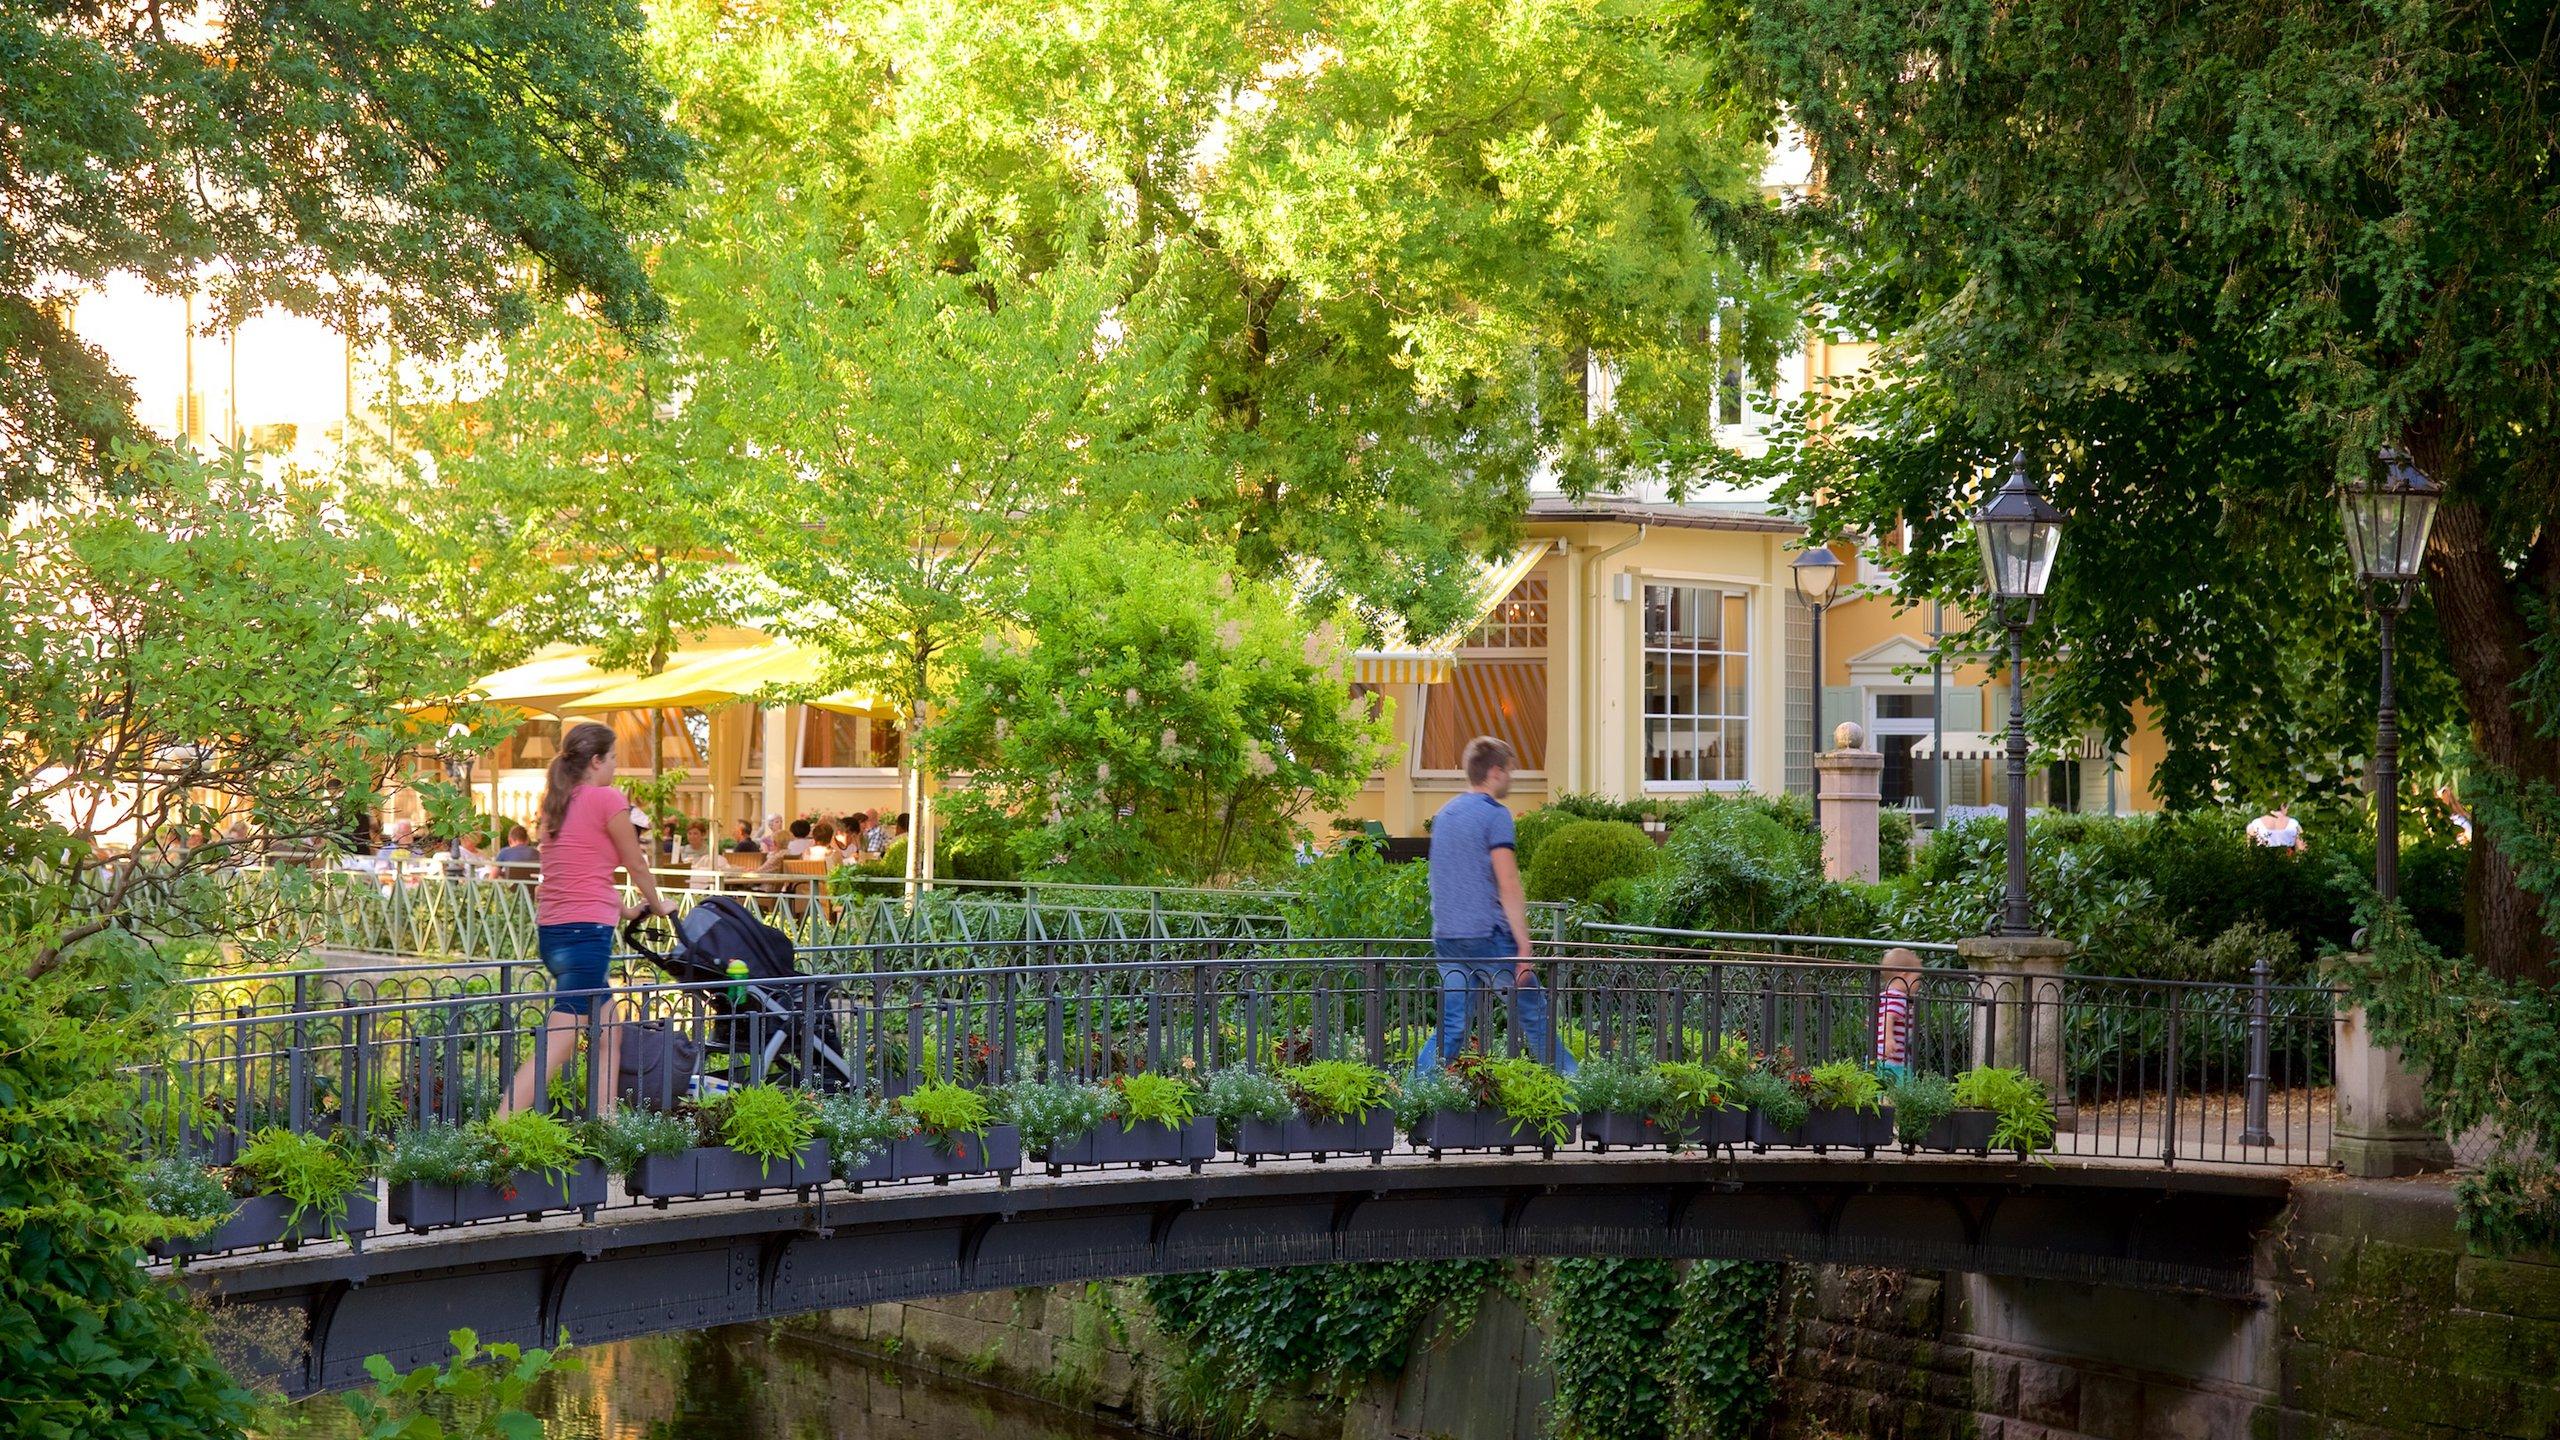 Baden-Baden which includes a bridge as well as a family